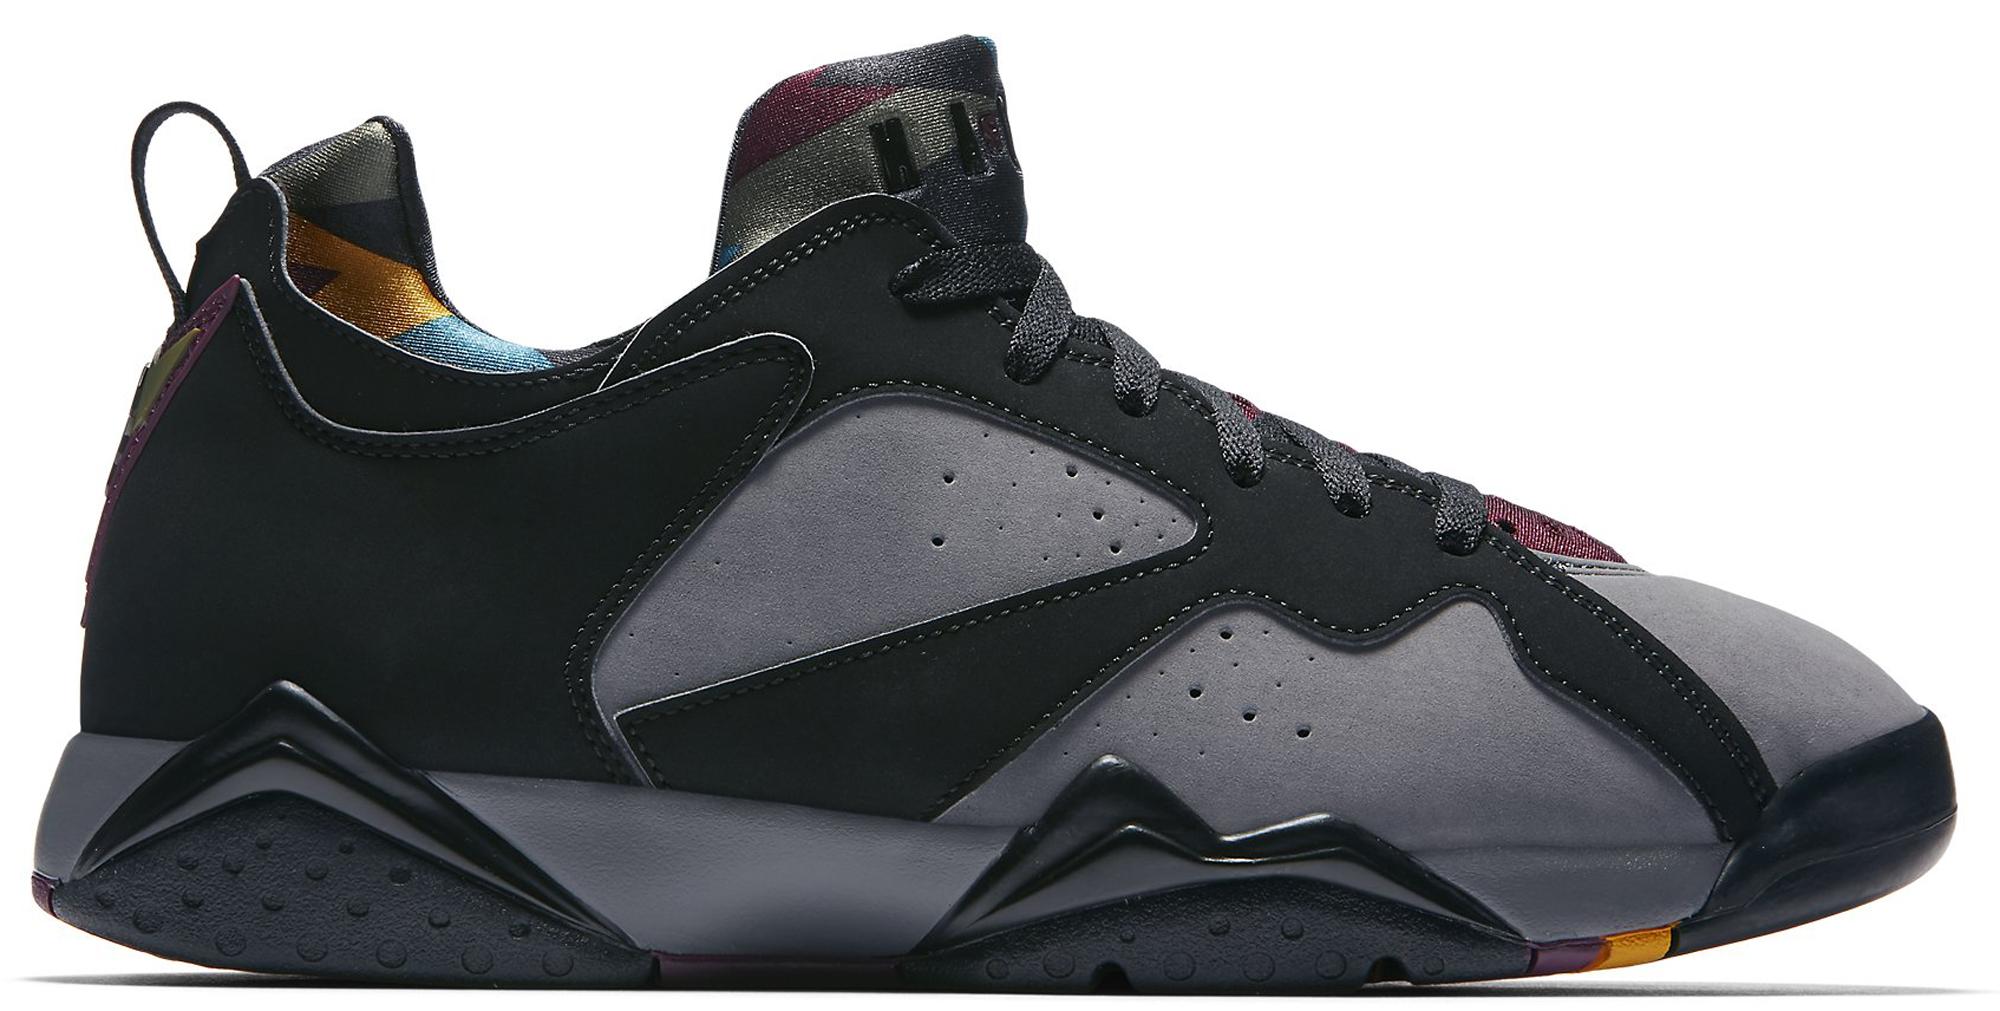 Jordan 7 Retro Low Bordeaux - Sneakers